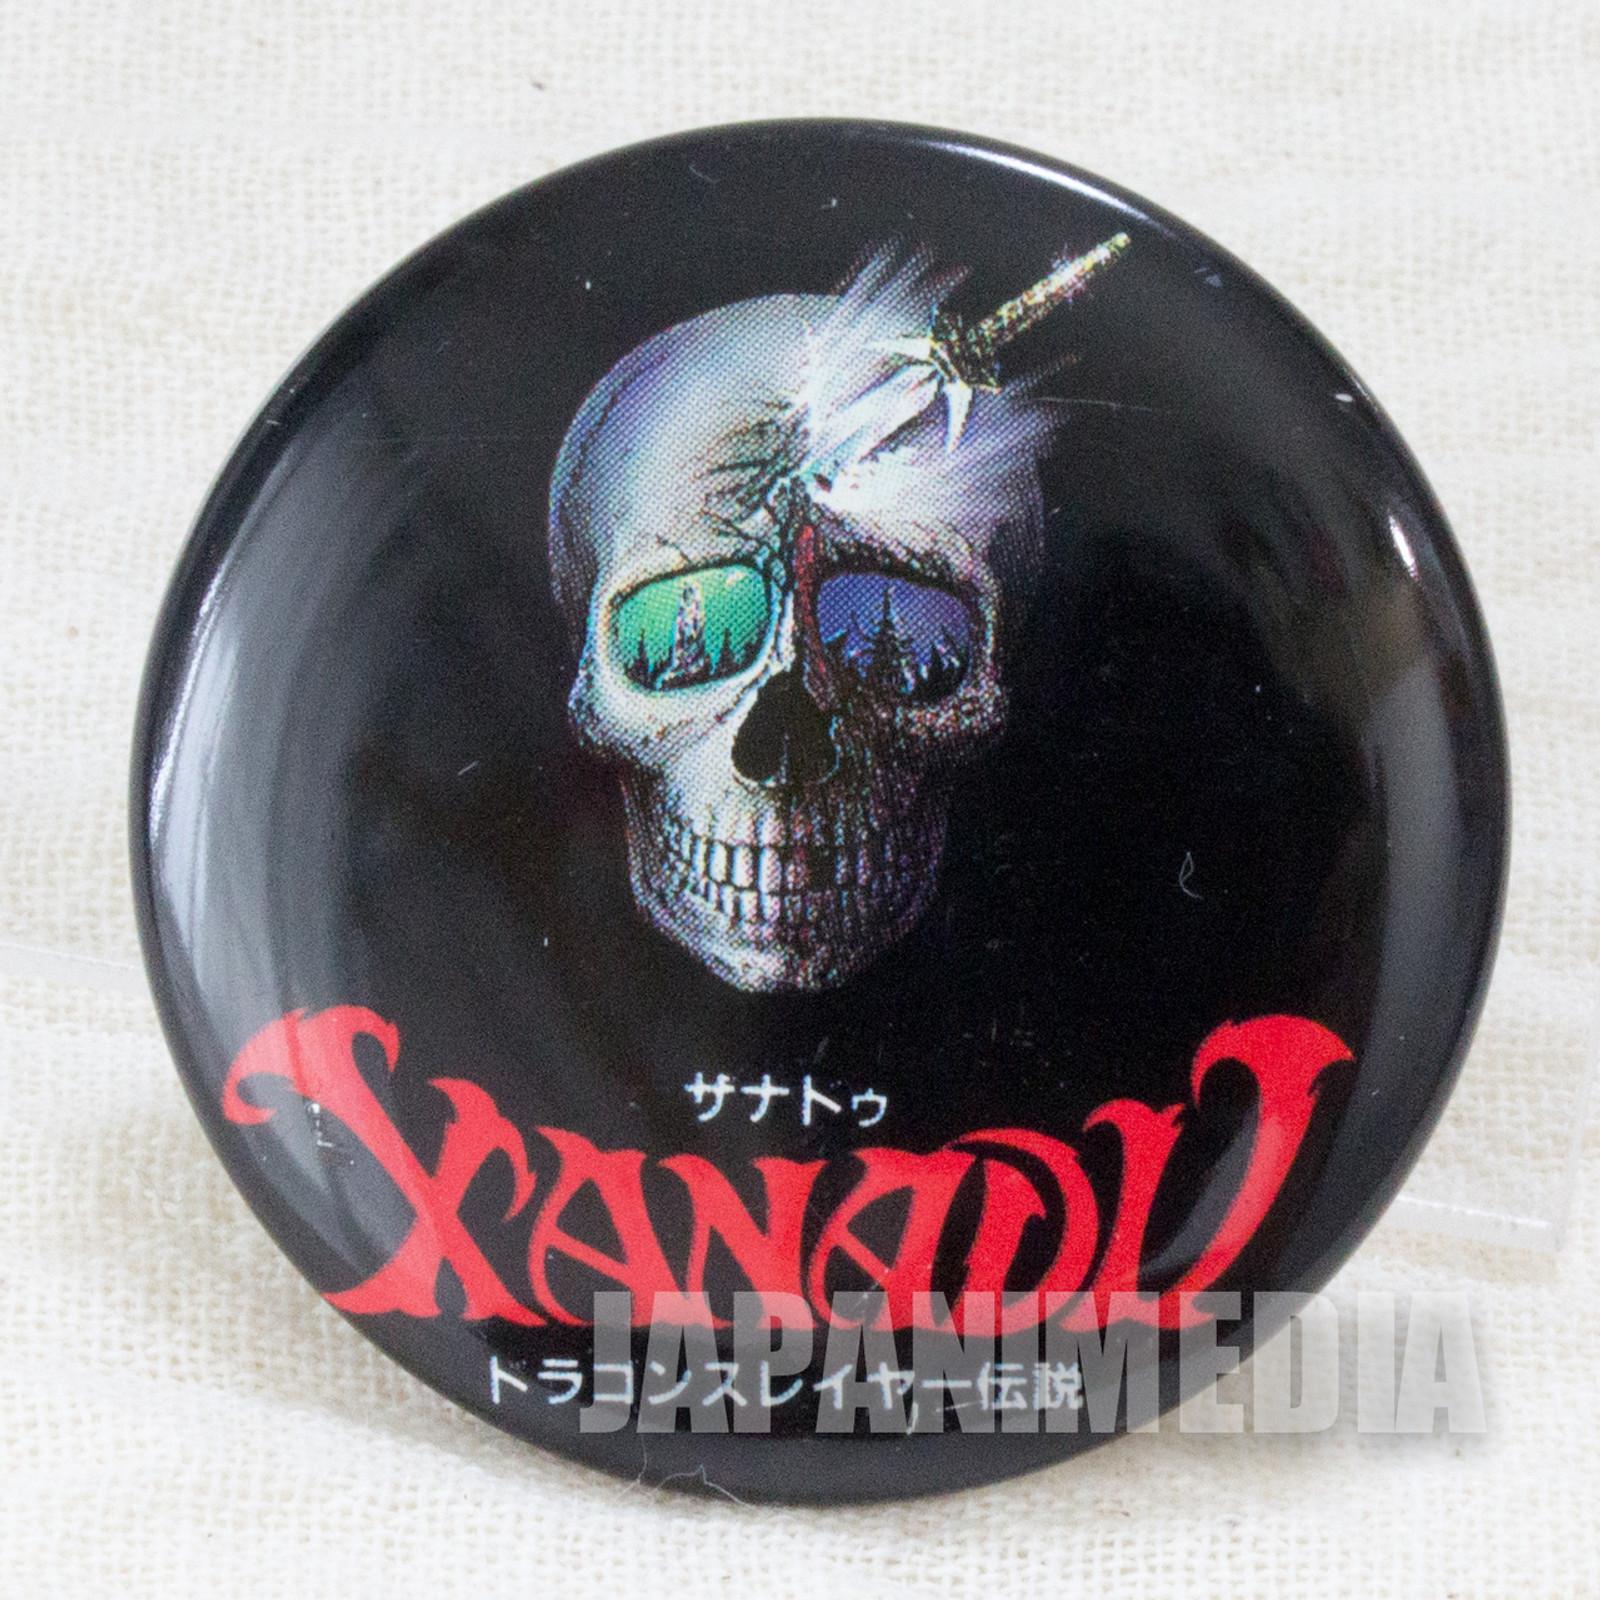 Retro RARE Xanadu Dragon Slayer Button Badge JAPAN FAMICOM NINTNEDO